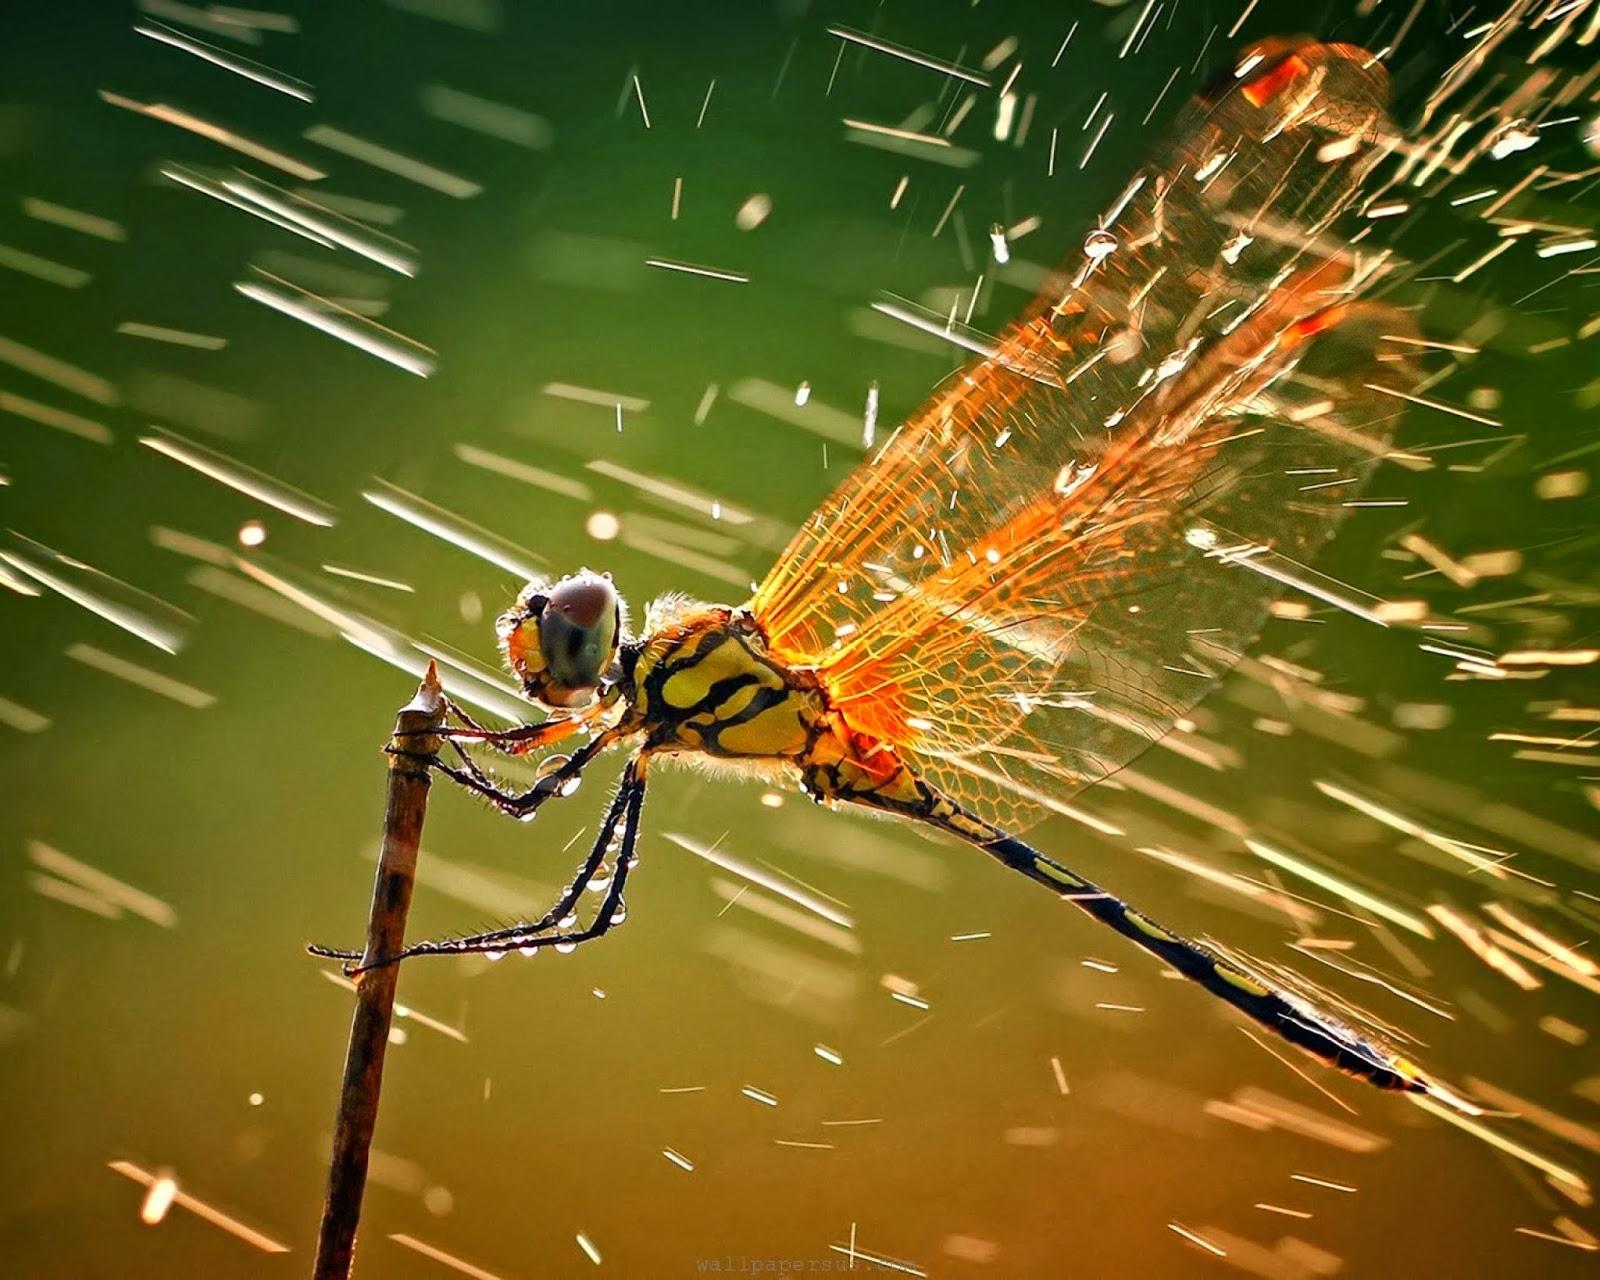 Dragonfly Wallpaper